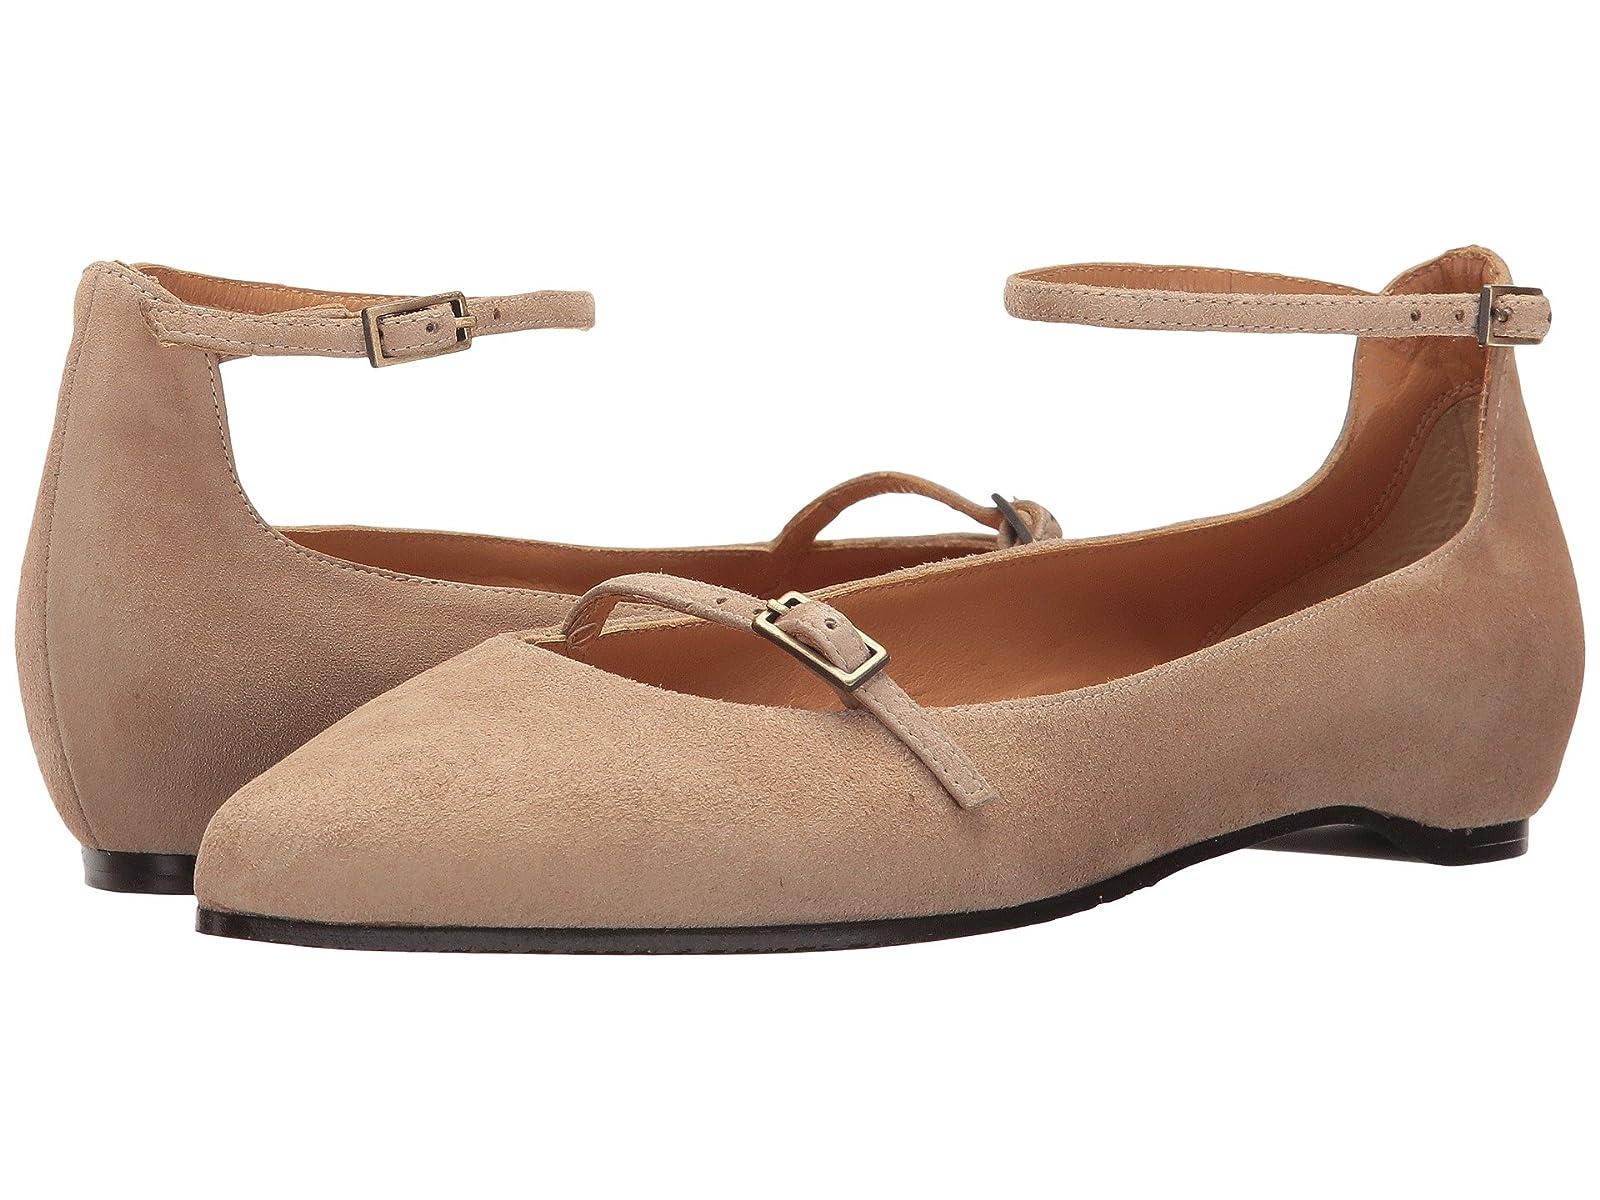 Stuart Weitzman StrapdownCheap and distinctive eye-catching shoes